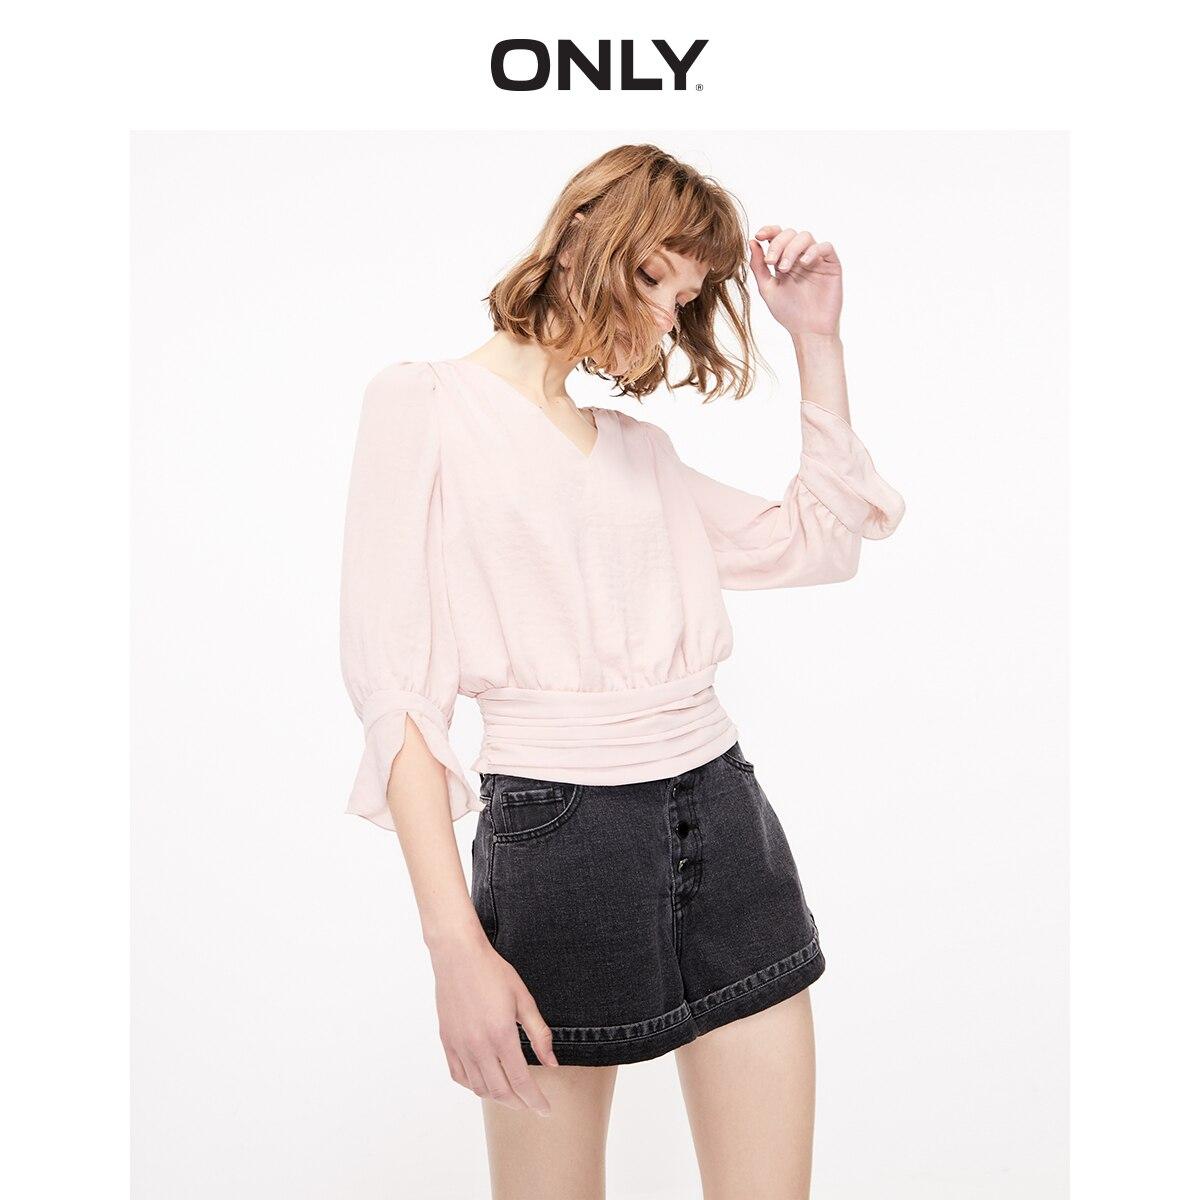 ONLY Women's V-neckline Elasticized Waist Long-sleeved Chiffon Shirt | 119258509